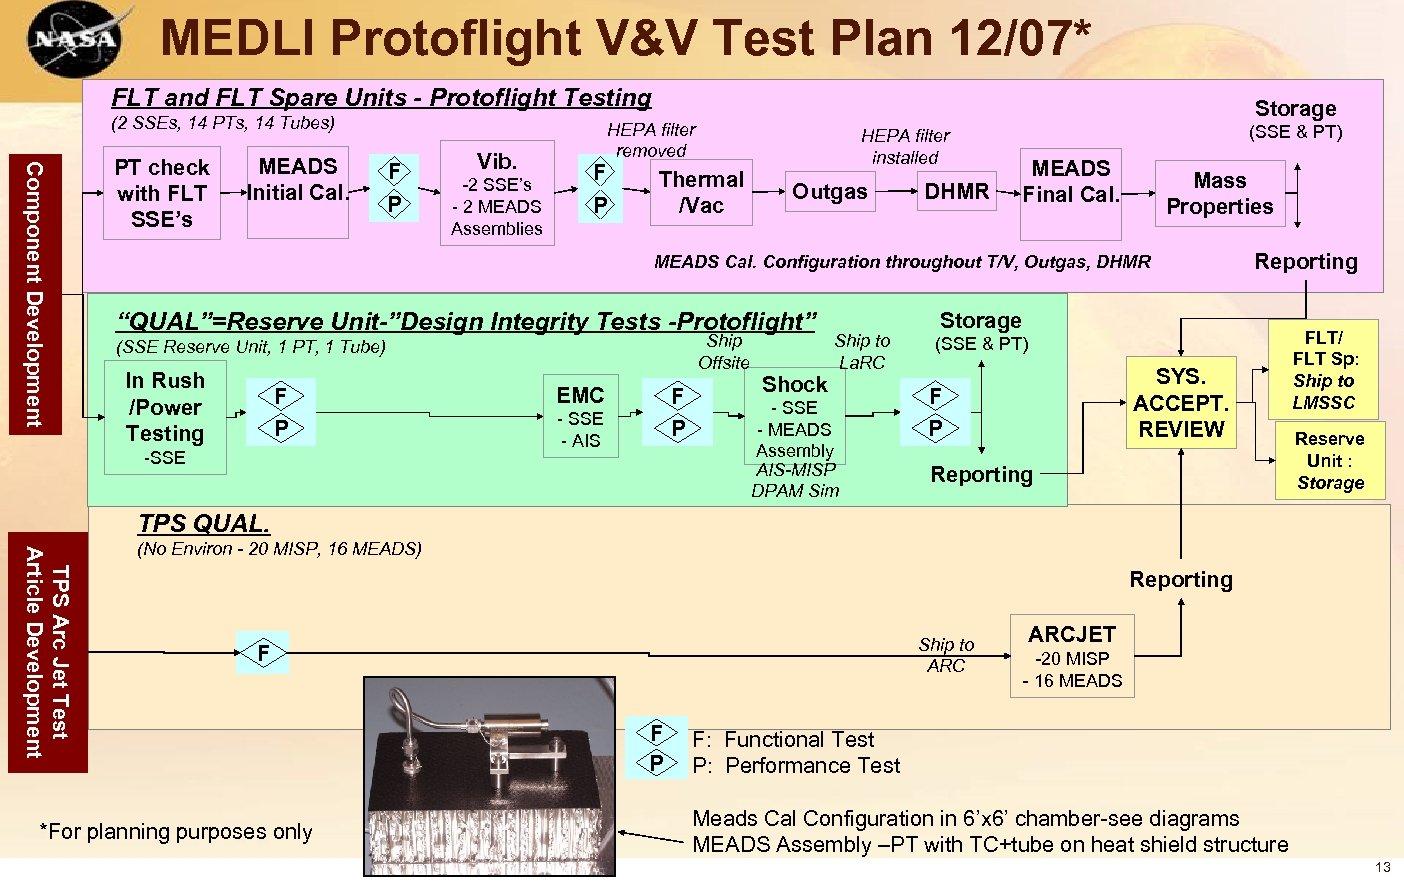 MEDLI Protoflight V&V Test Plan 12/07* FLT and FLT Spare Units - Protoflight Testing